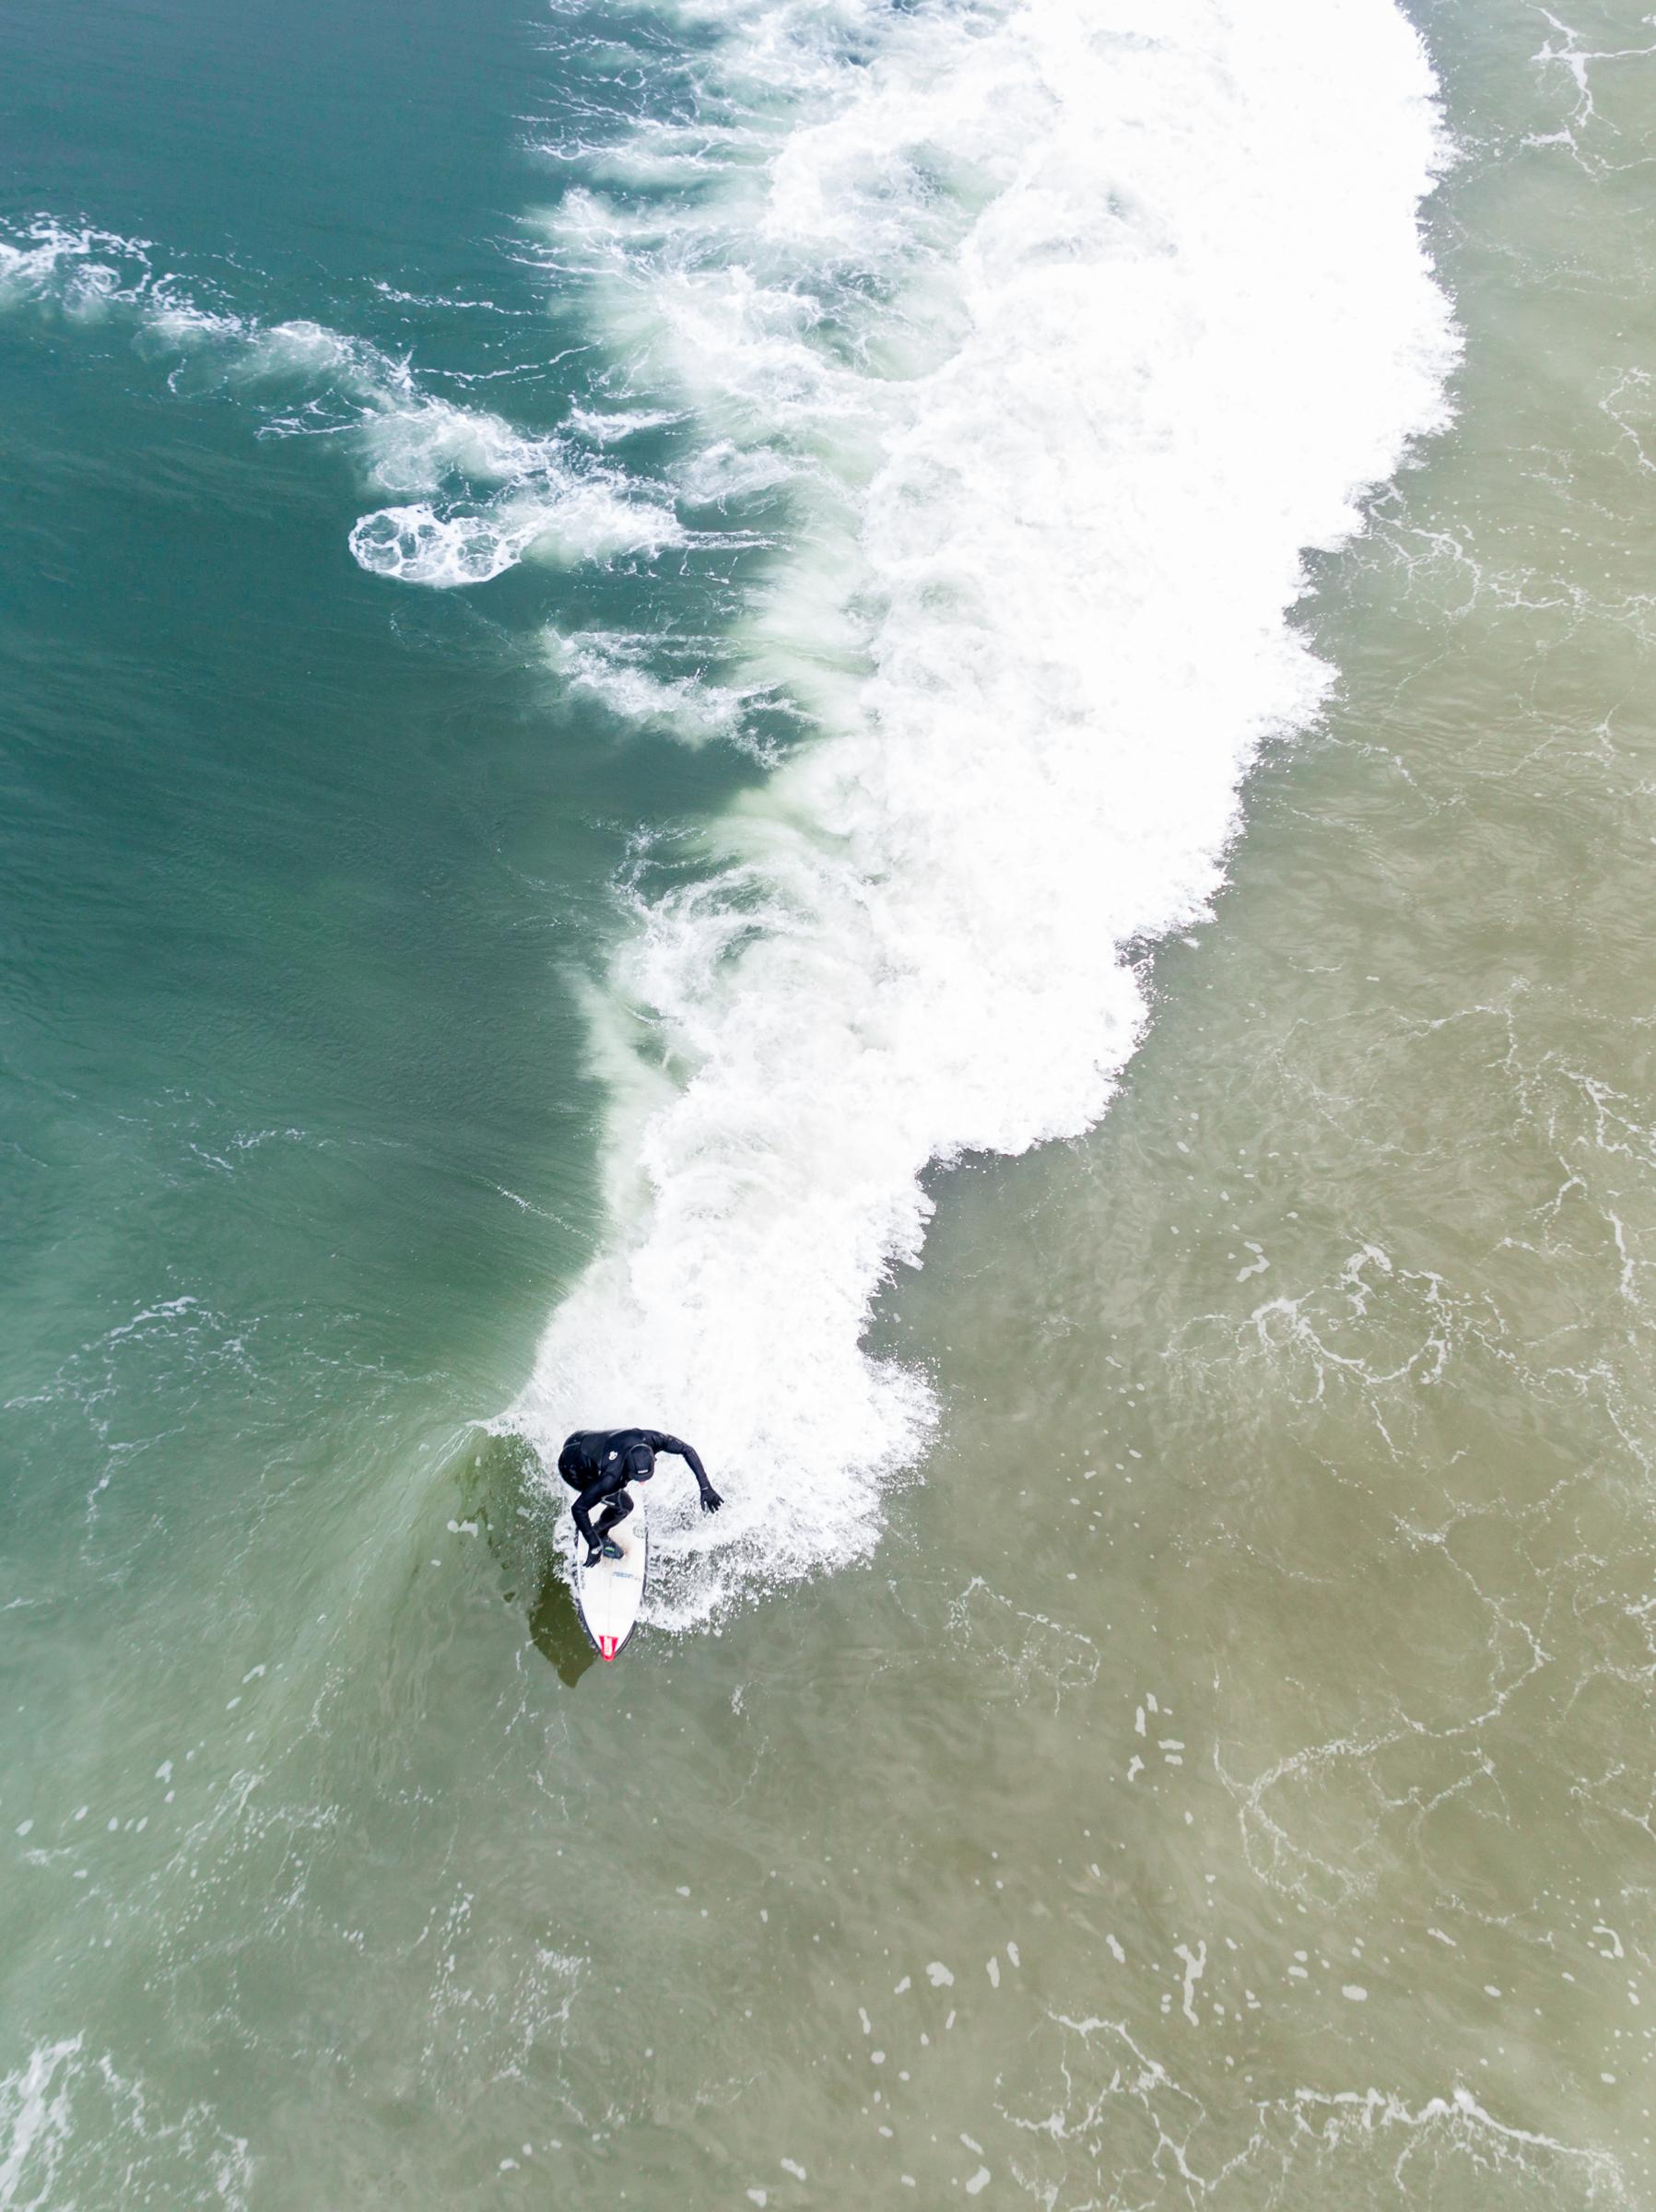 Ty_Poland_Inspire_Docks_Surf-5.jpg